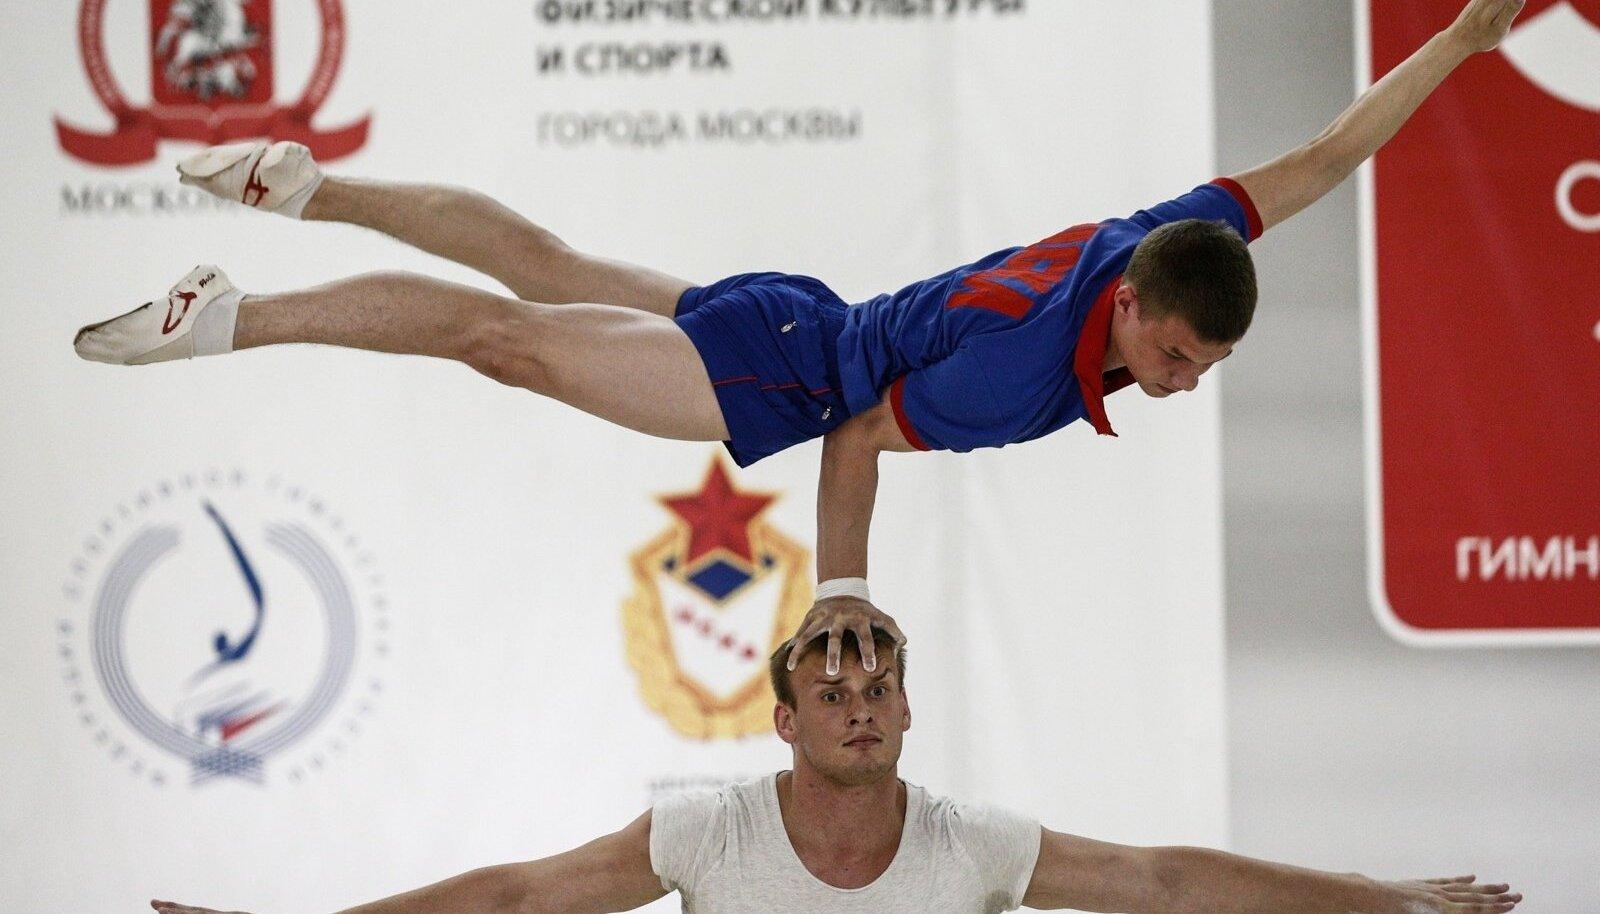 Vene sportlased trennis